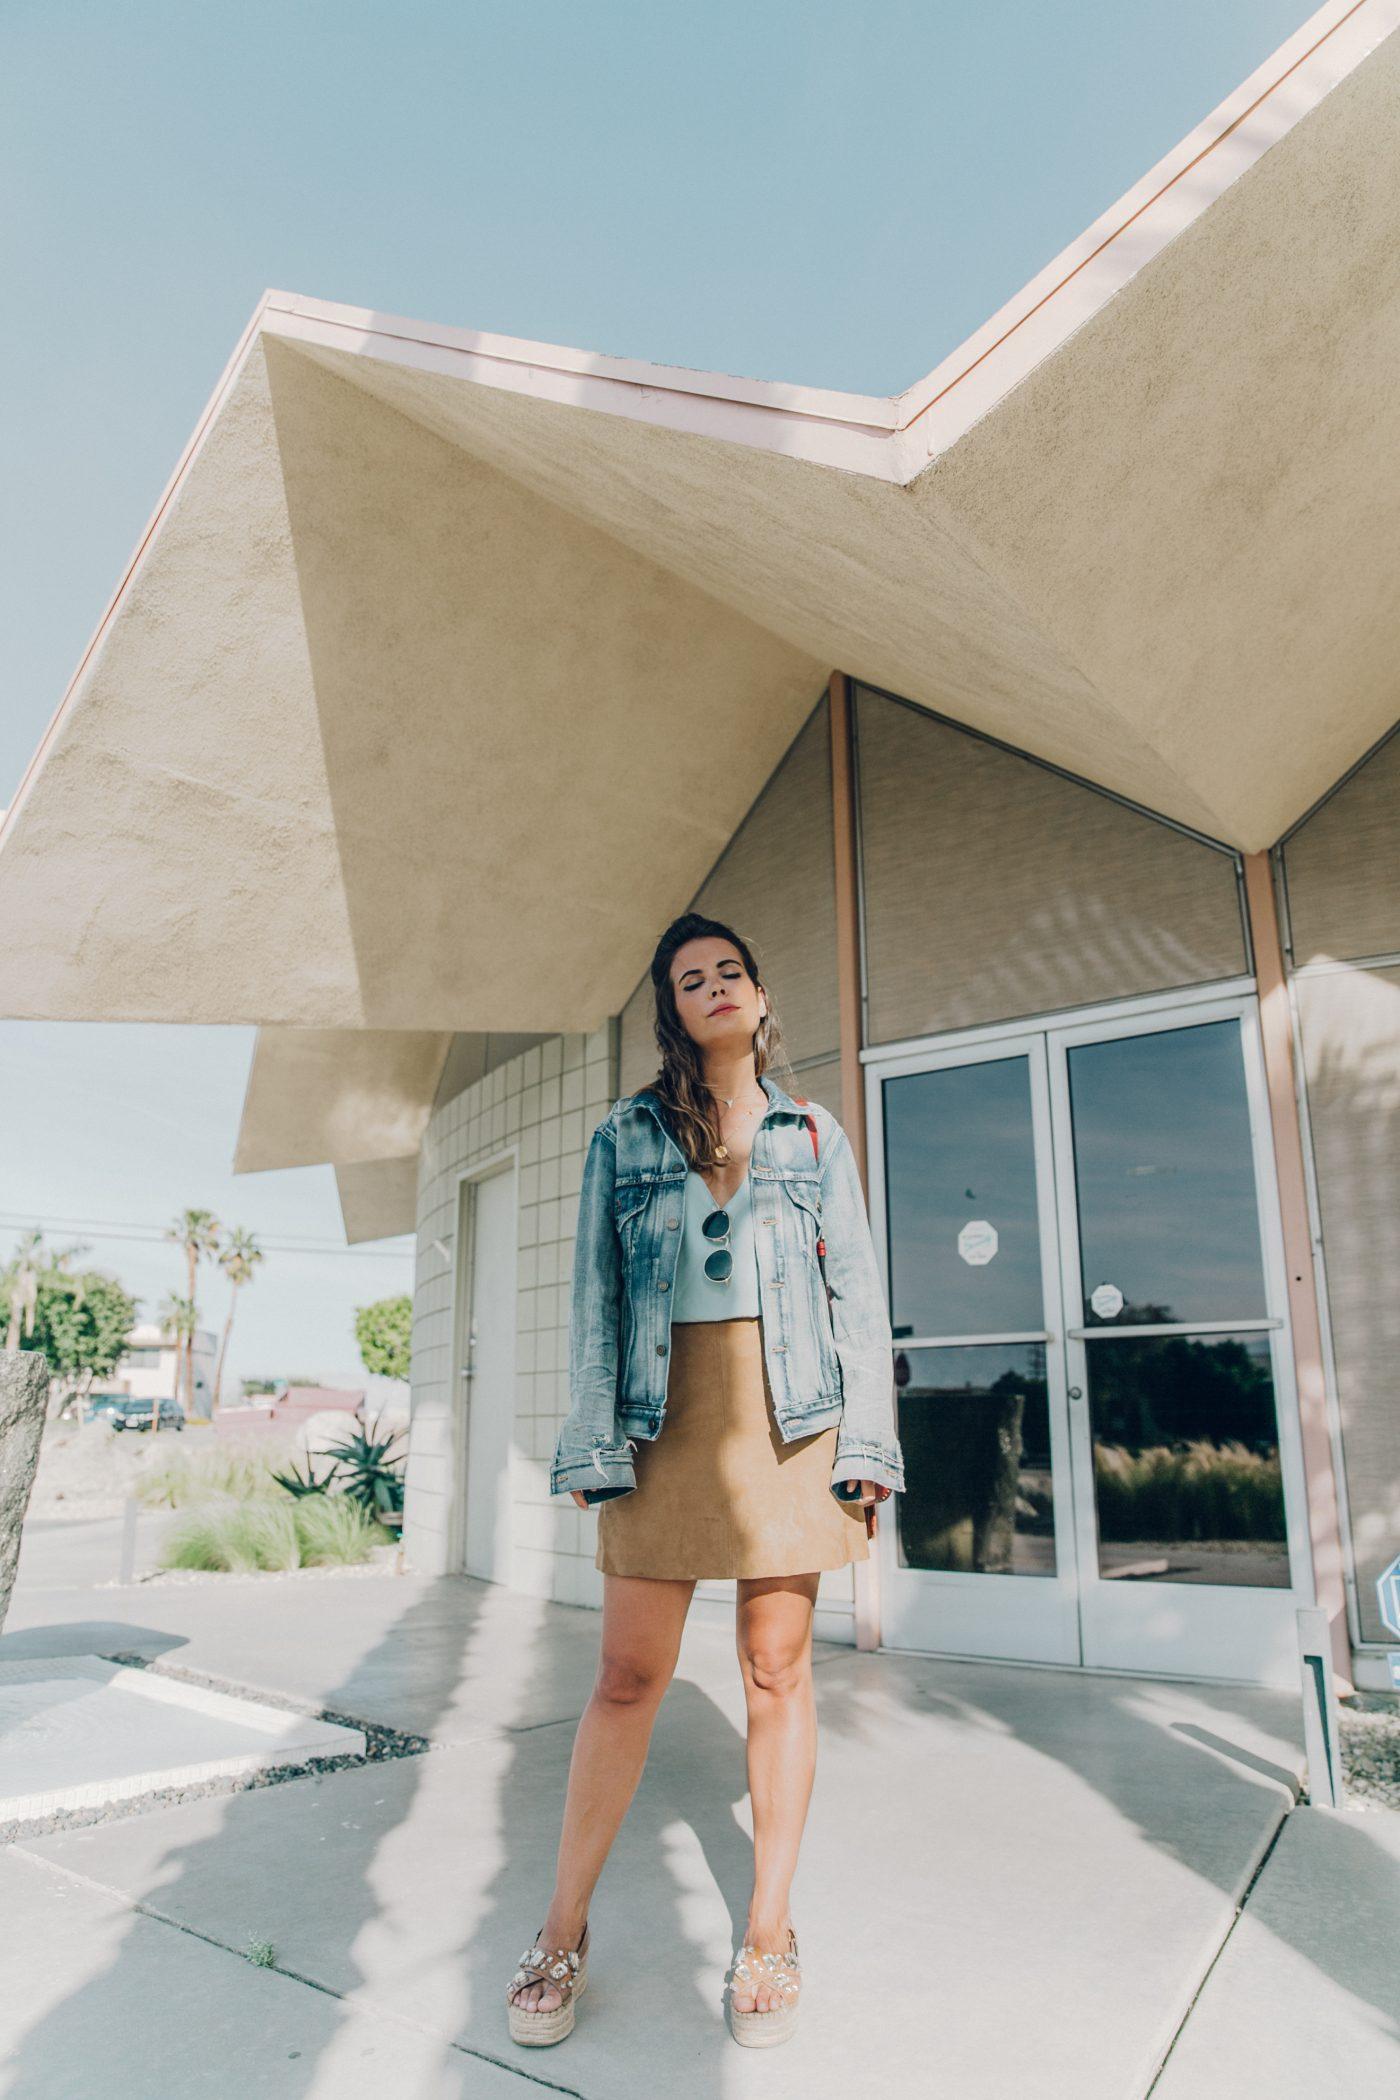 Denim_Jacket-Saint_Laurent-Chloe_Top-Suede_Skirt-Chloe_Hudson_Bag-Espadrilles-Coachella-Palm_Springs-Outfit-Collage_Vintage-8